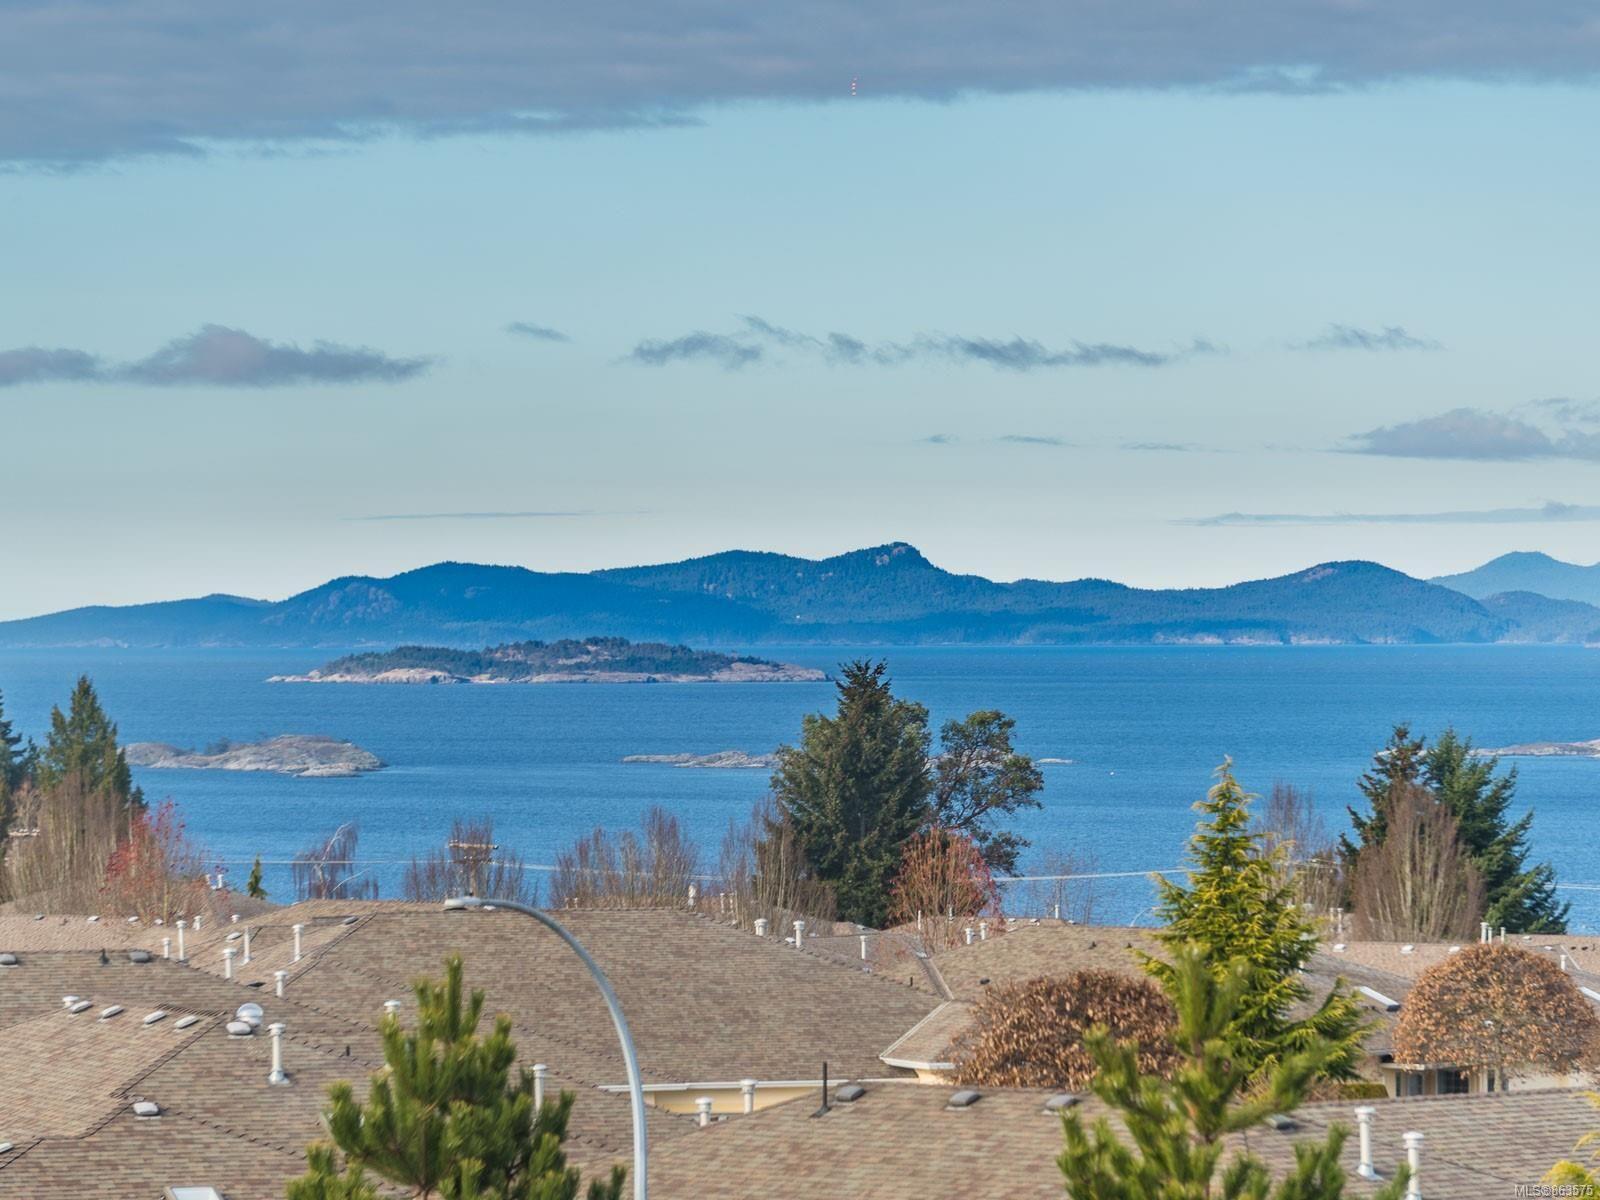 Main Photo: 421 6310 McRobb Ave in : Na North Nanaimo Condo for sale (Nanaimo)  : MLS®# 863575